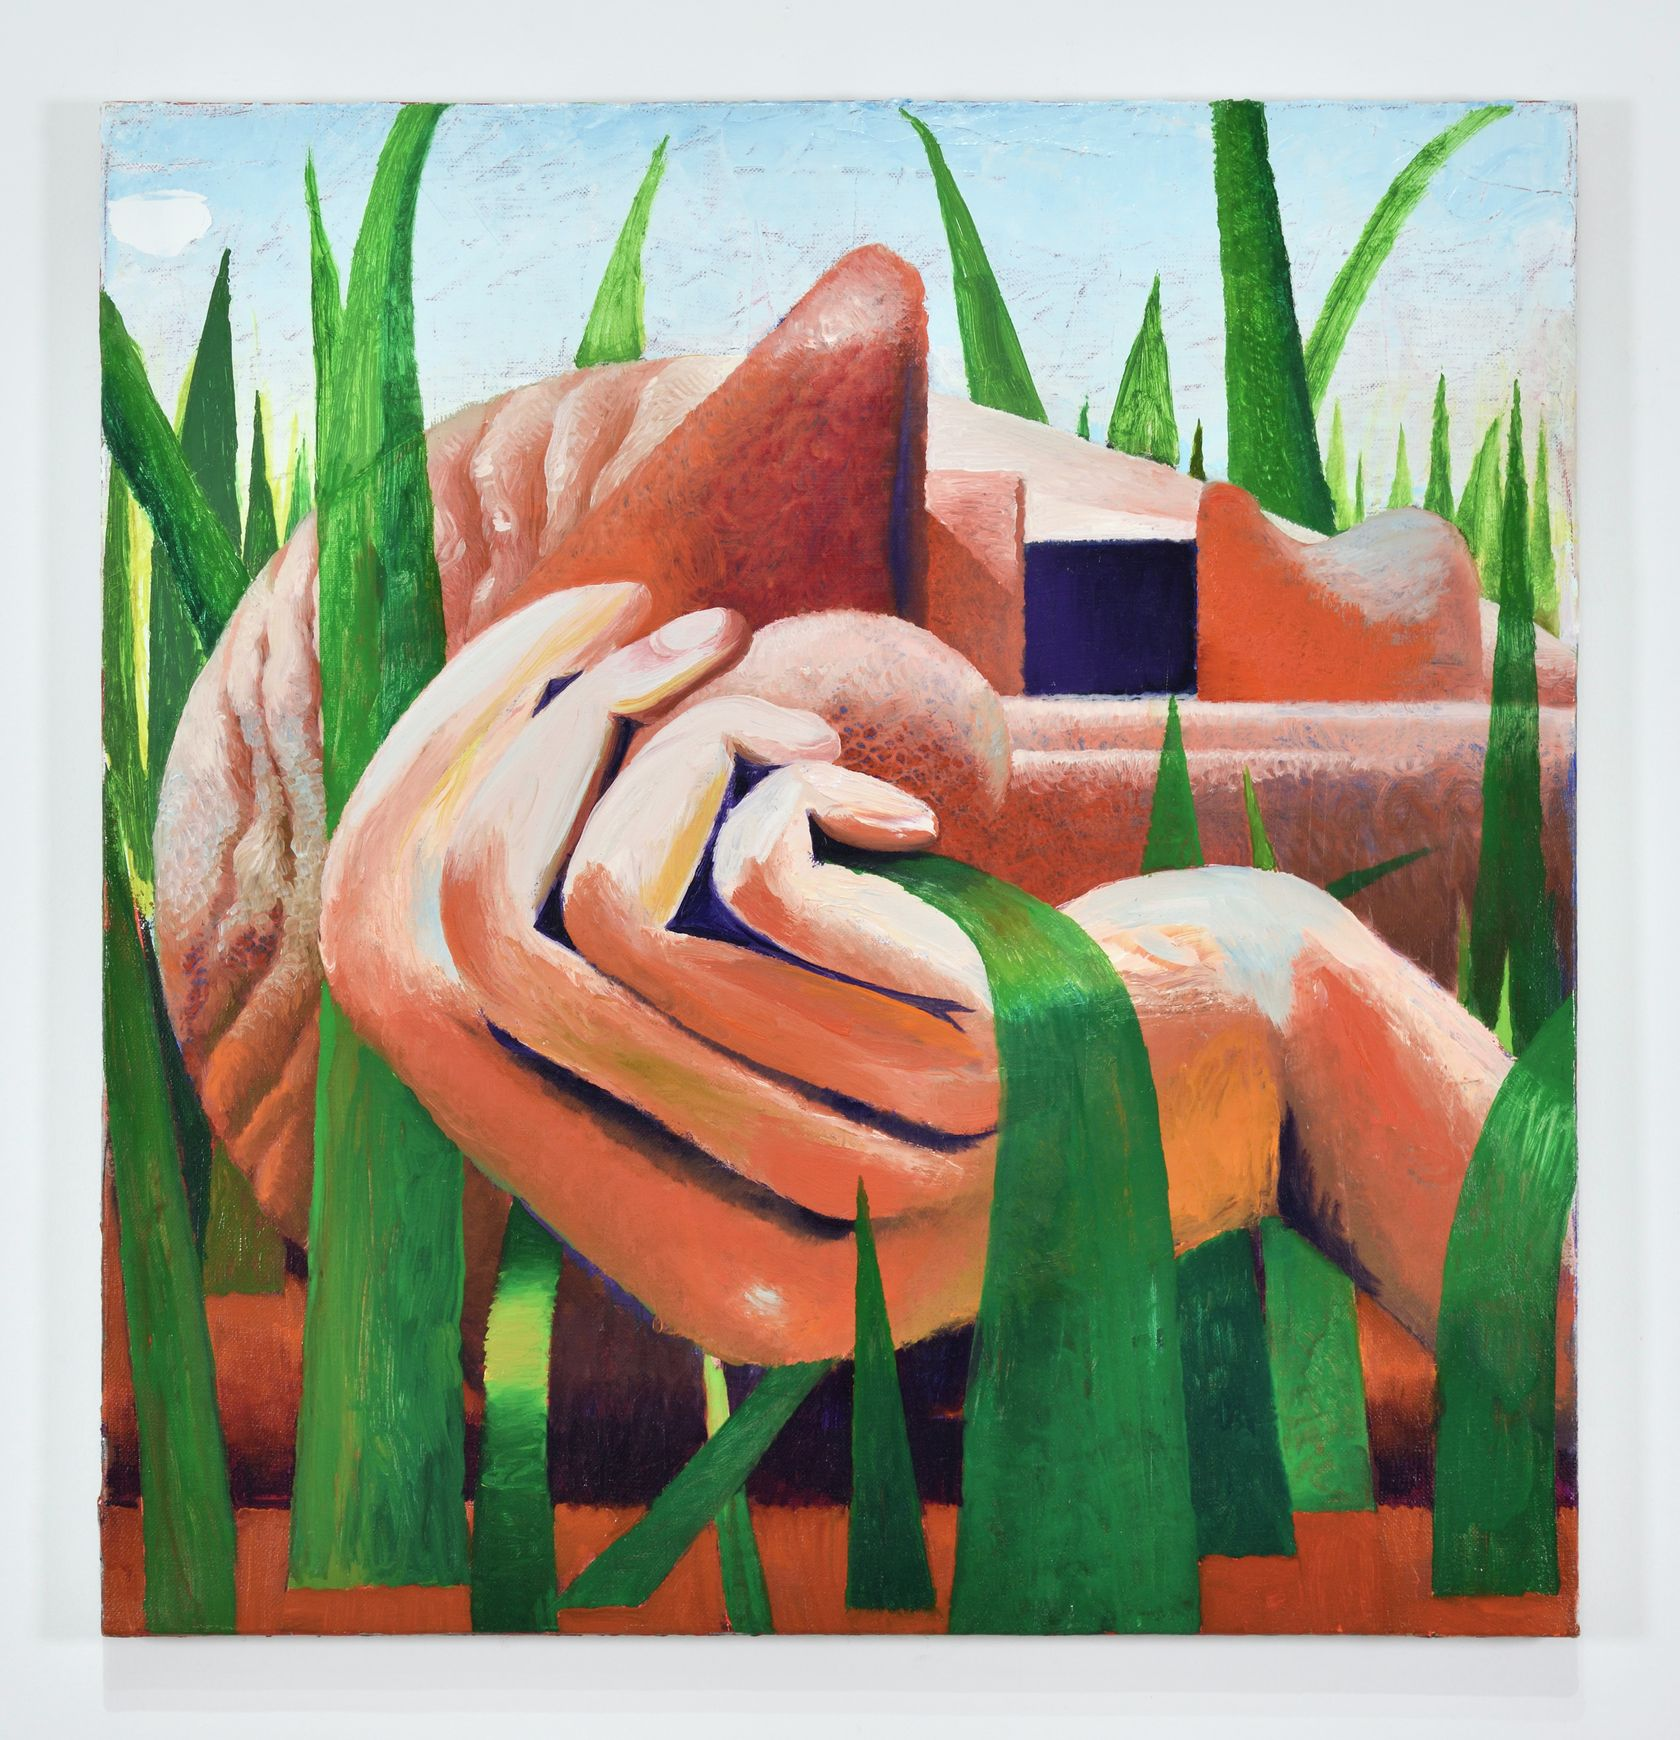 Laurent Proux, Tête dans l'herbe (n°7), 2021 Huile sur toile65 × 62 cm / 25 5/8 × 24 3/8 in. | 69 × 66 × 4 cm / 27 1/8 × 26  × 1 5/8 in. (encadré/framed)